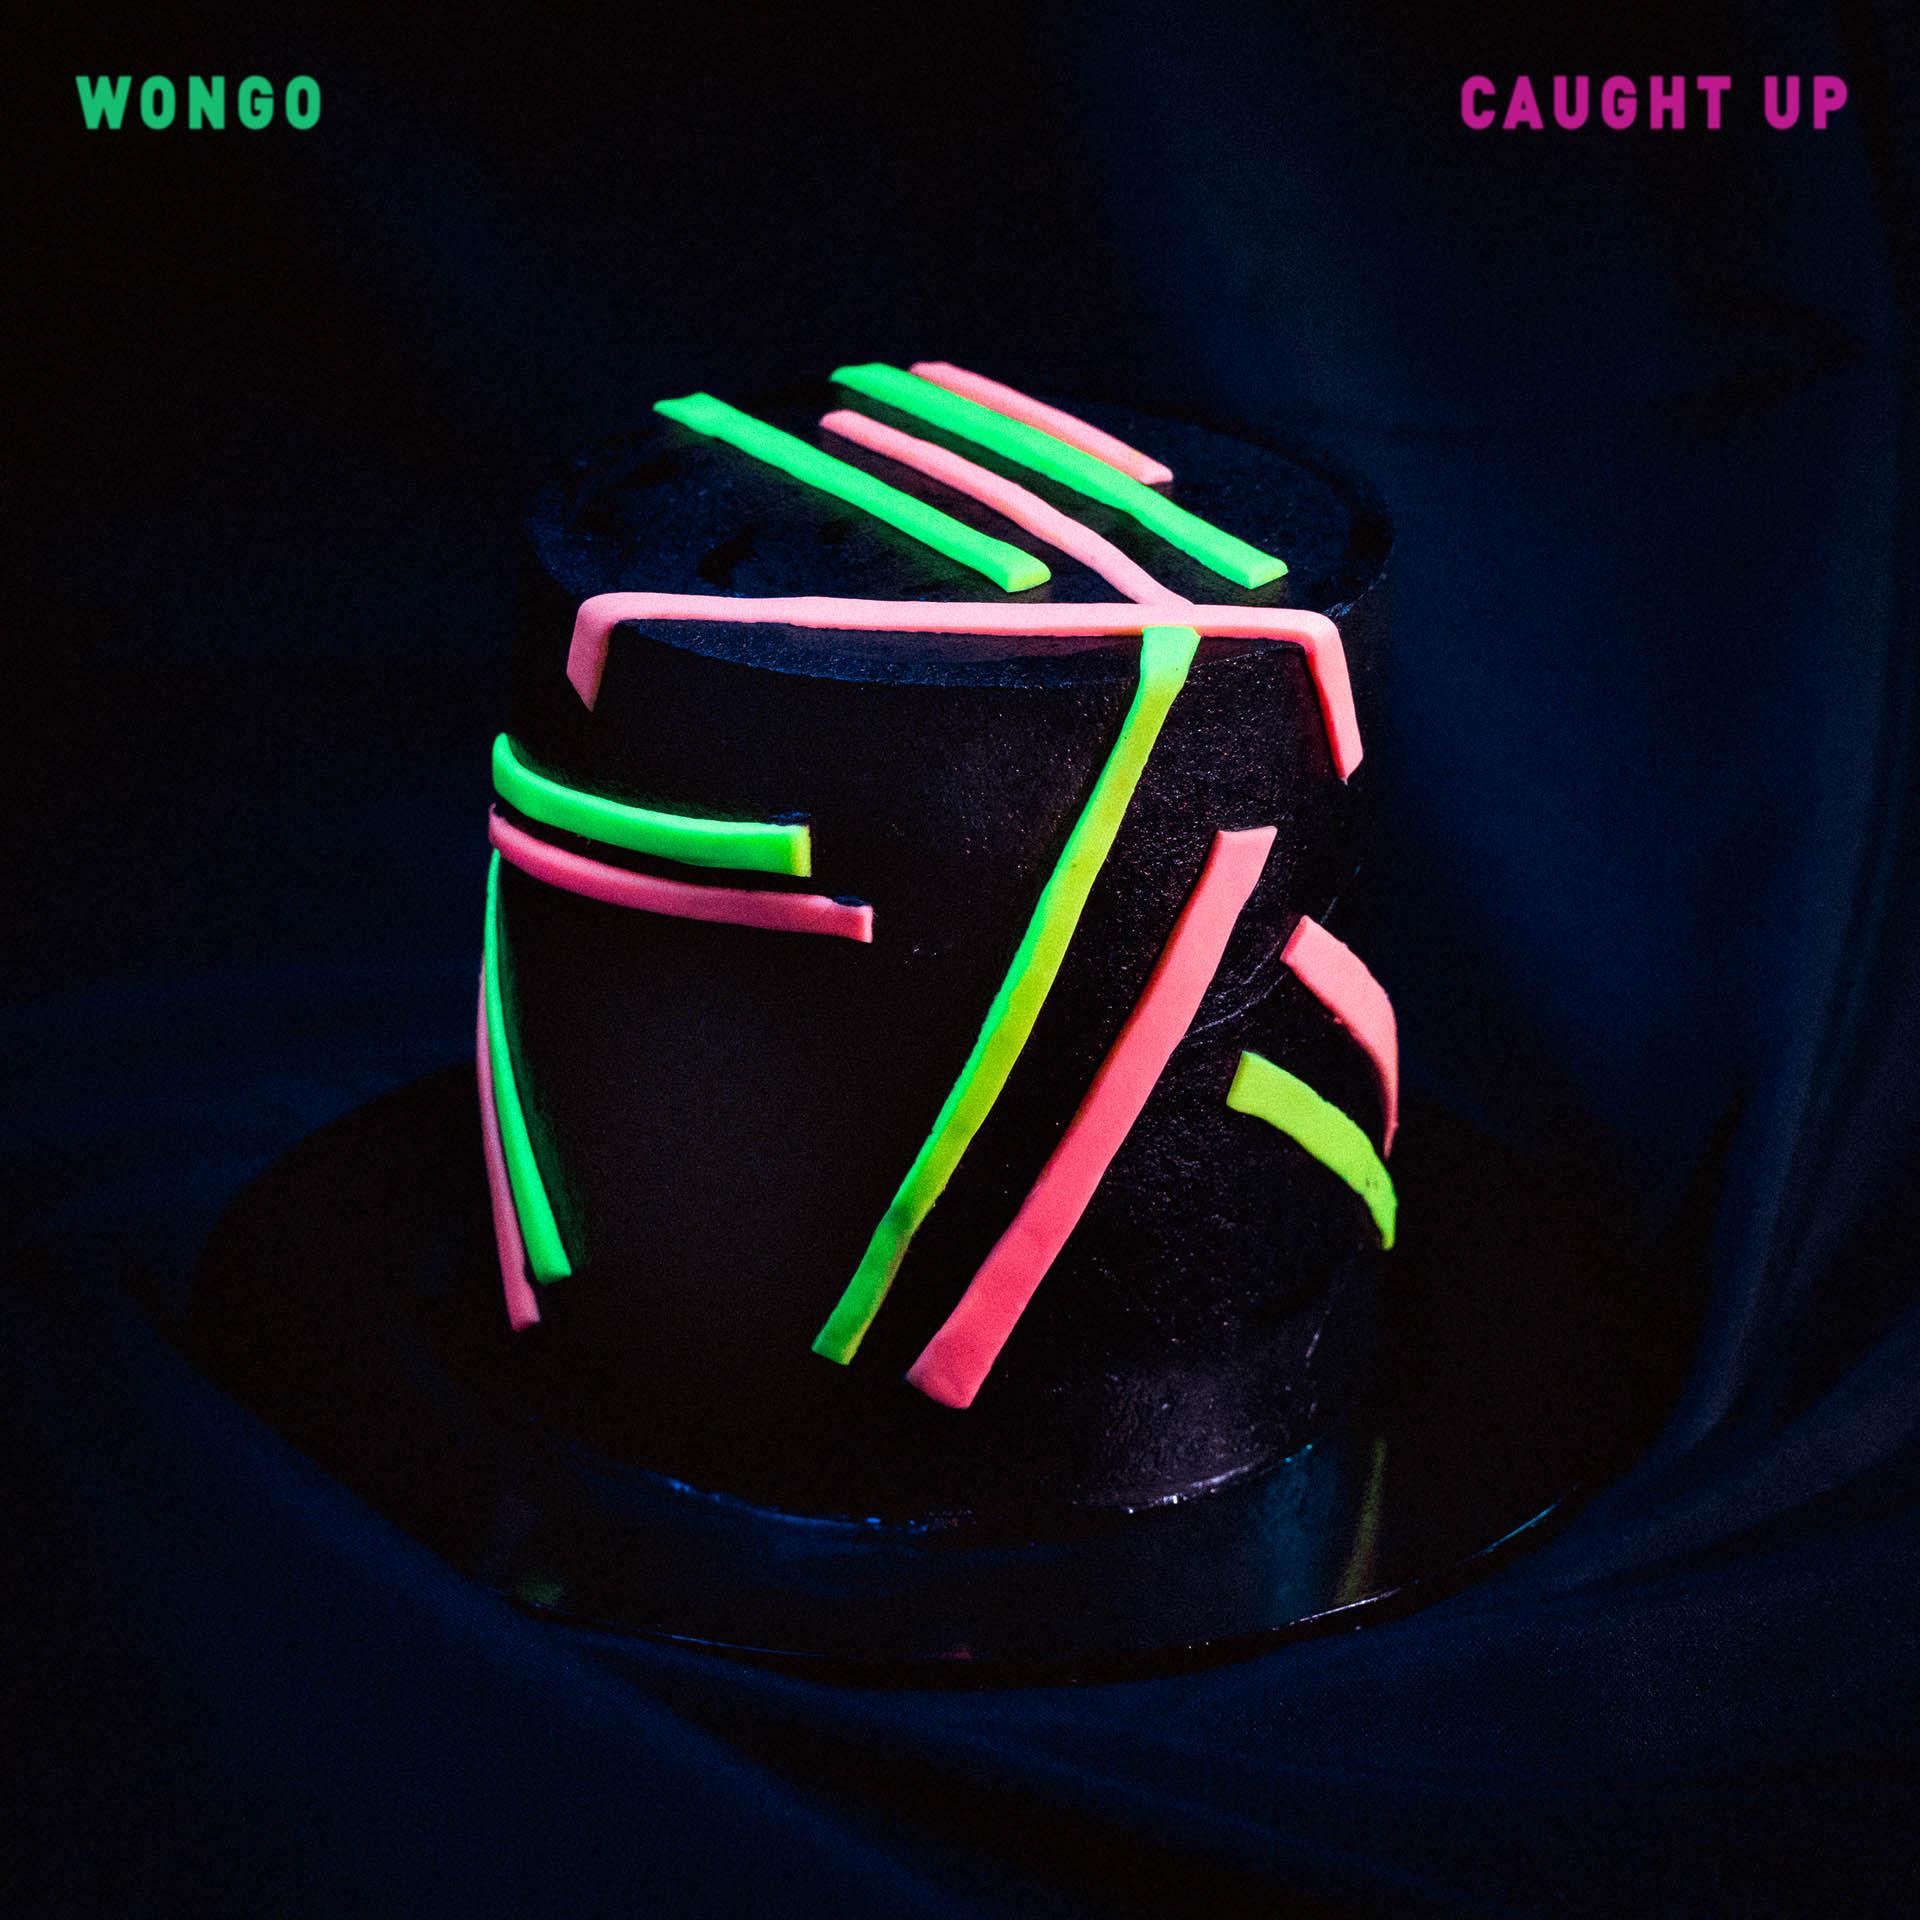 Wongo - Caught Up feat. SHE KORO